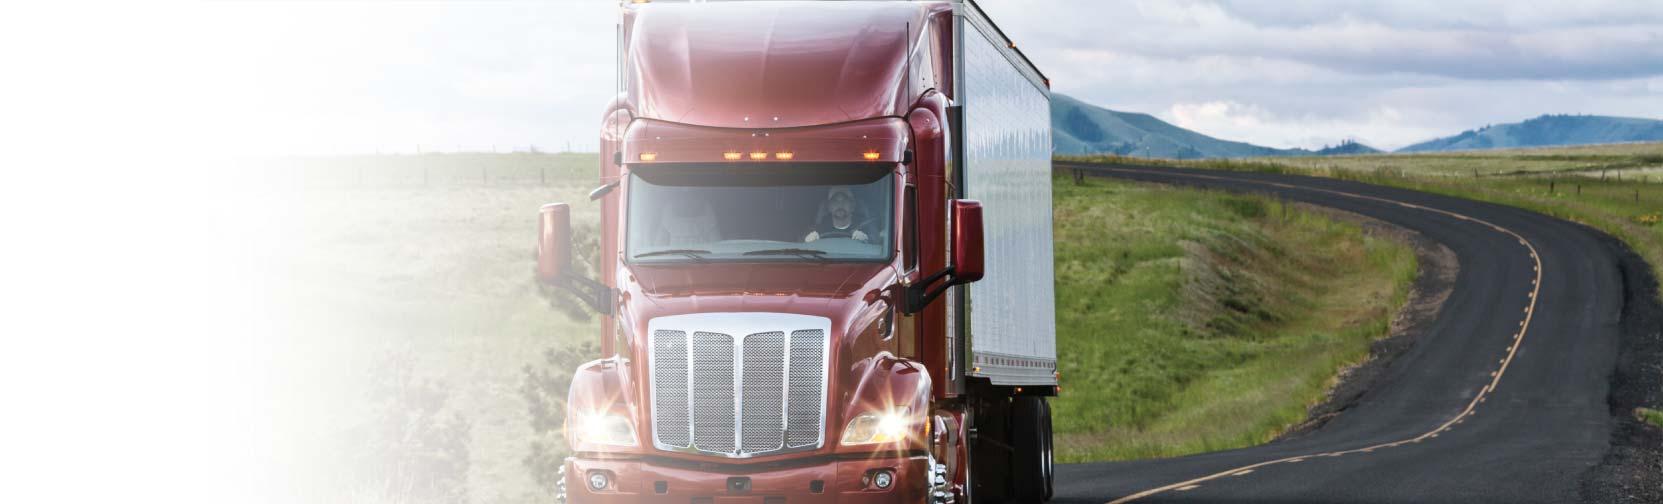 Art transportation services - truck on a highway - Art Work Fine Art Services